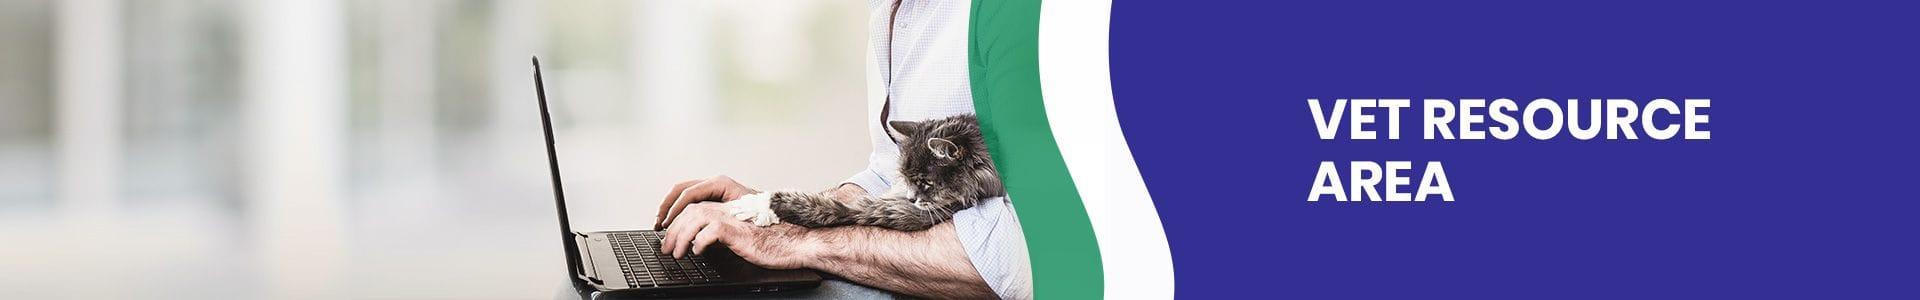 Vet Resource Area | Veterinary Specialist Services